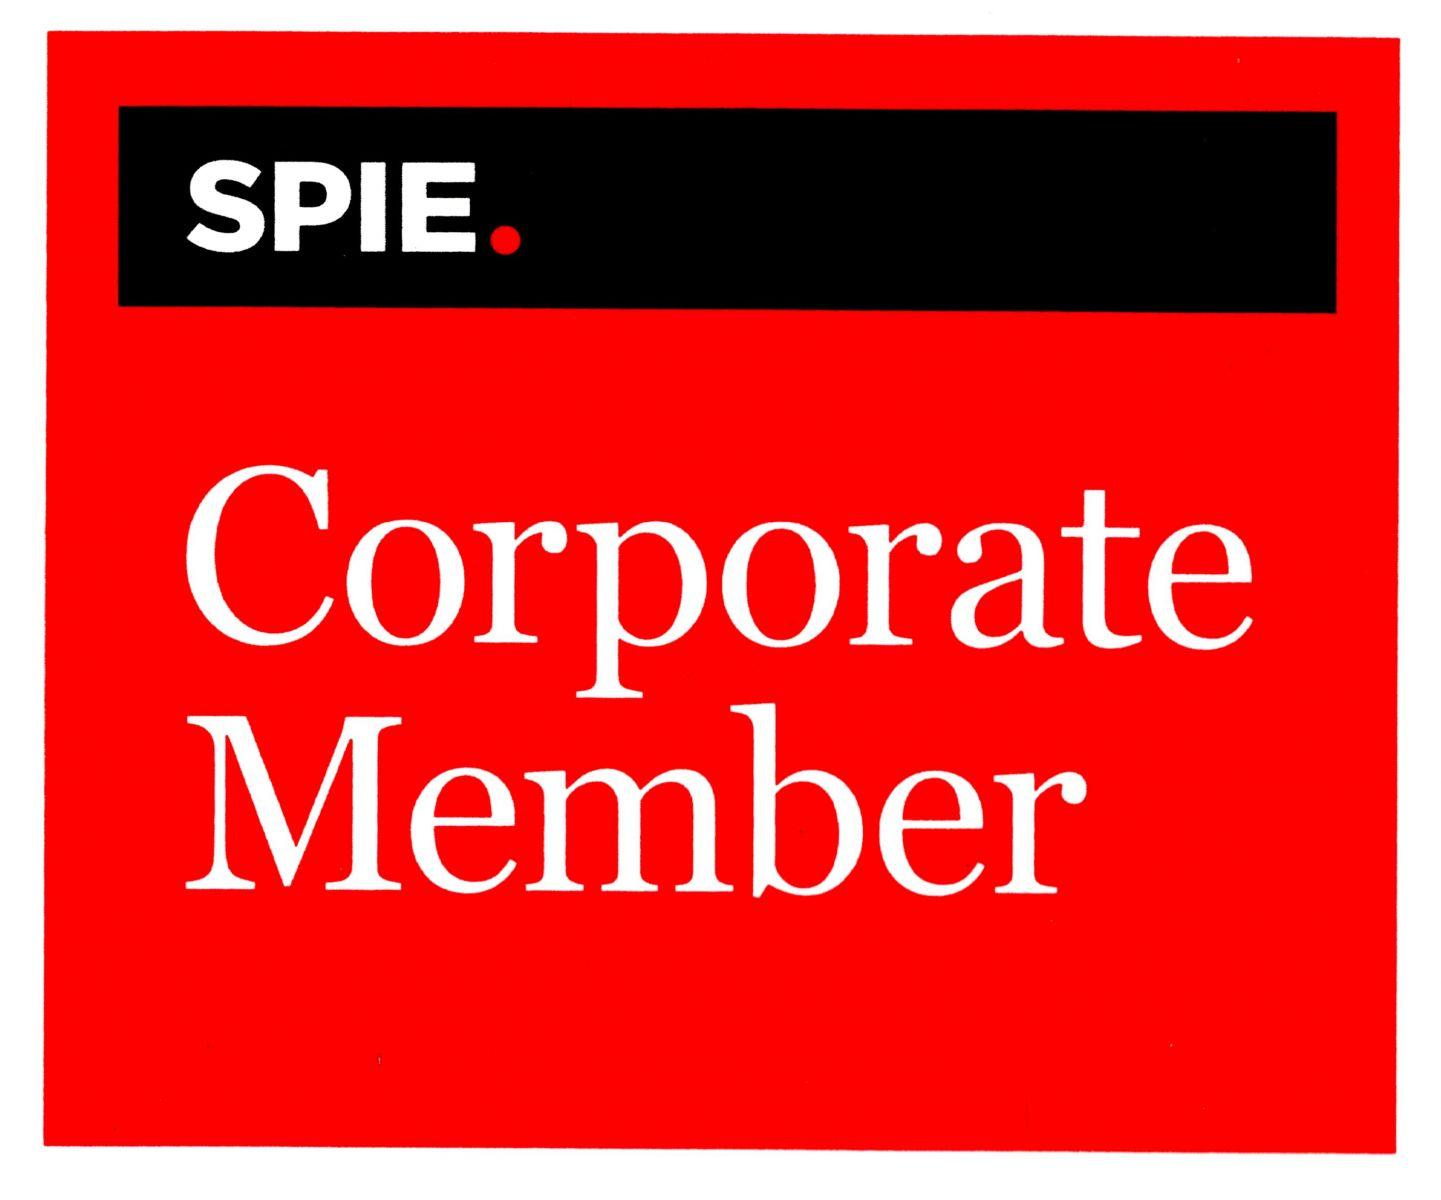 Международное общество оптики и фотоники SPIE (Society of Photo-Optical Instrumentation Engineers)